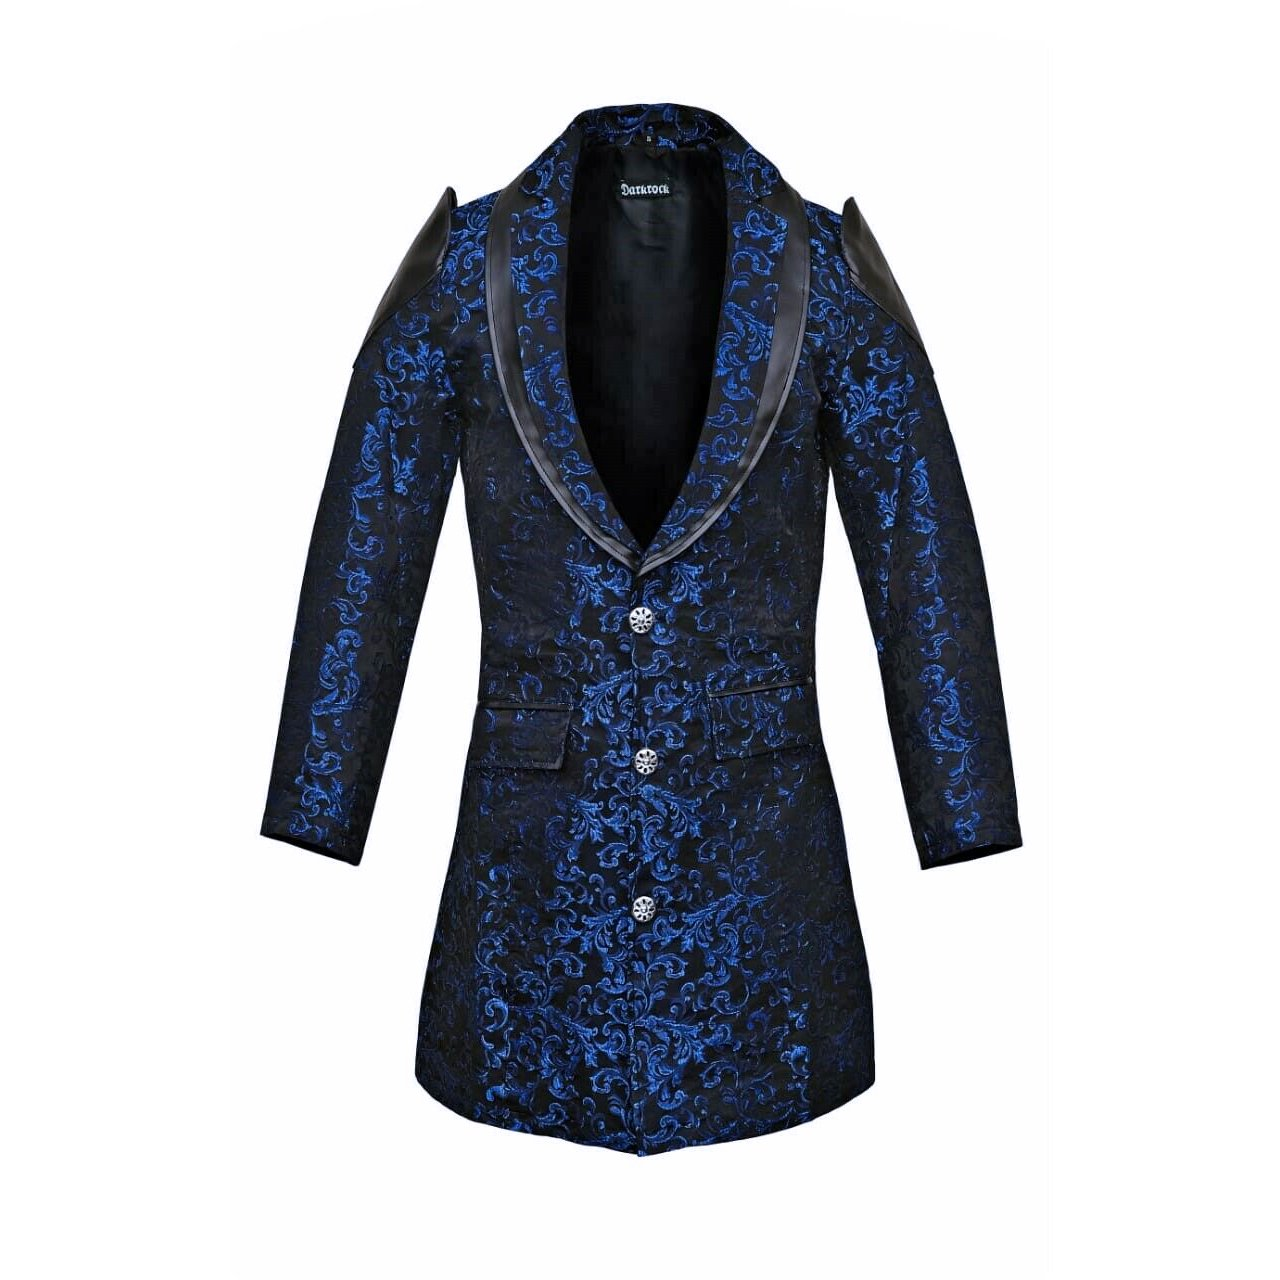 DARKROCK Men's Jacket Coat Blue Damask Gothic Steampunk VTG Aristocrat faux leather (2)